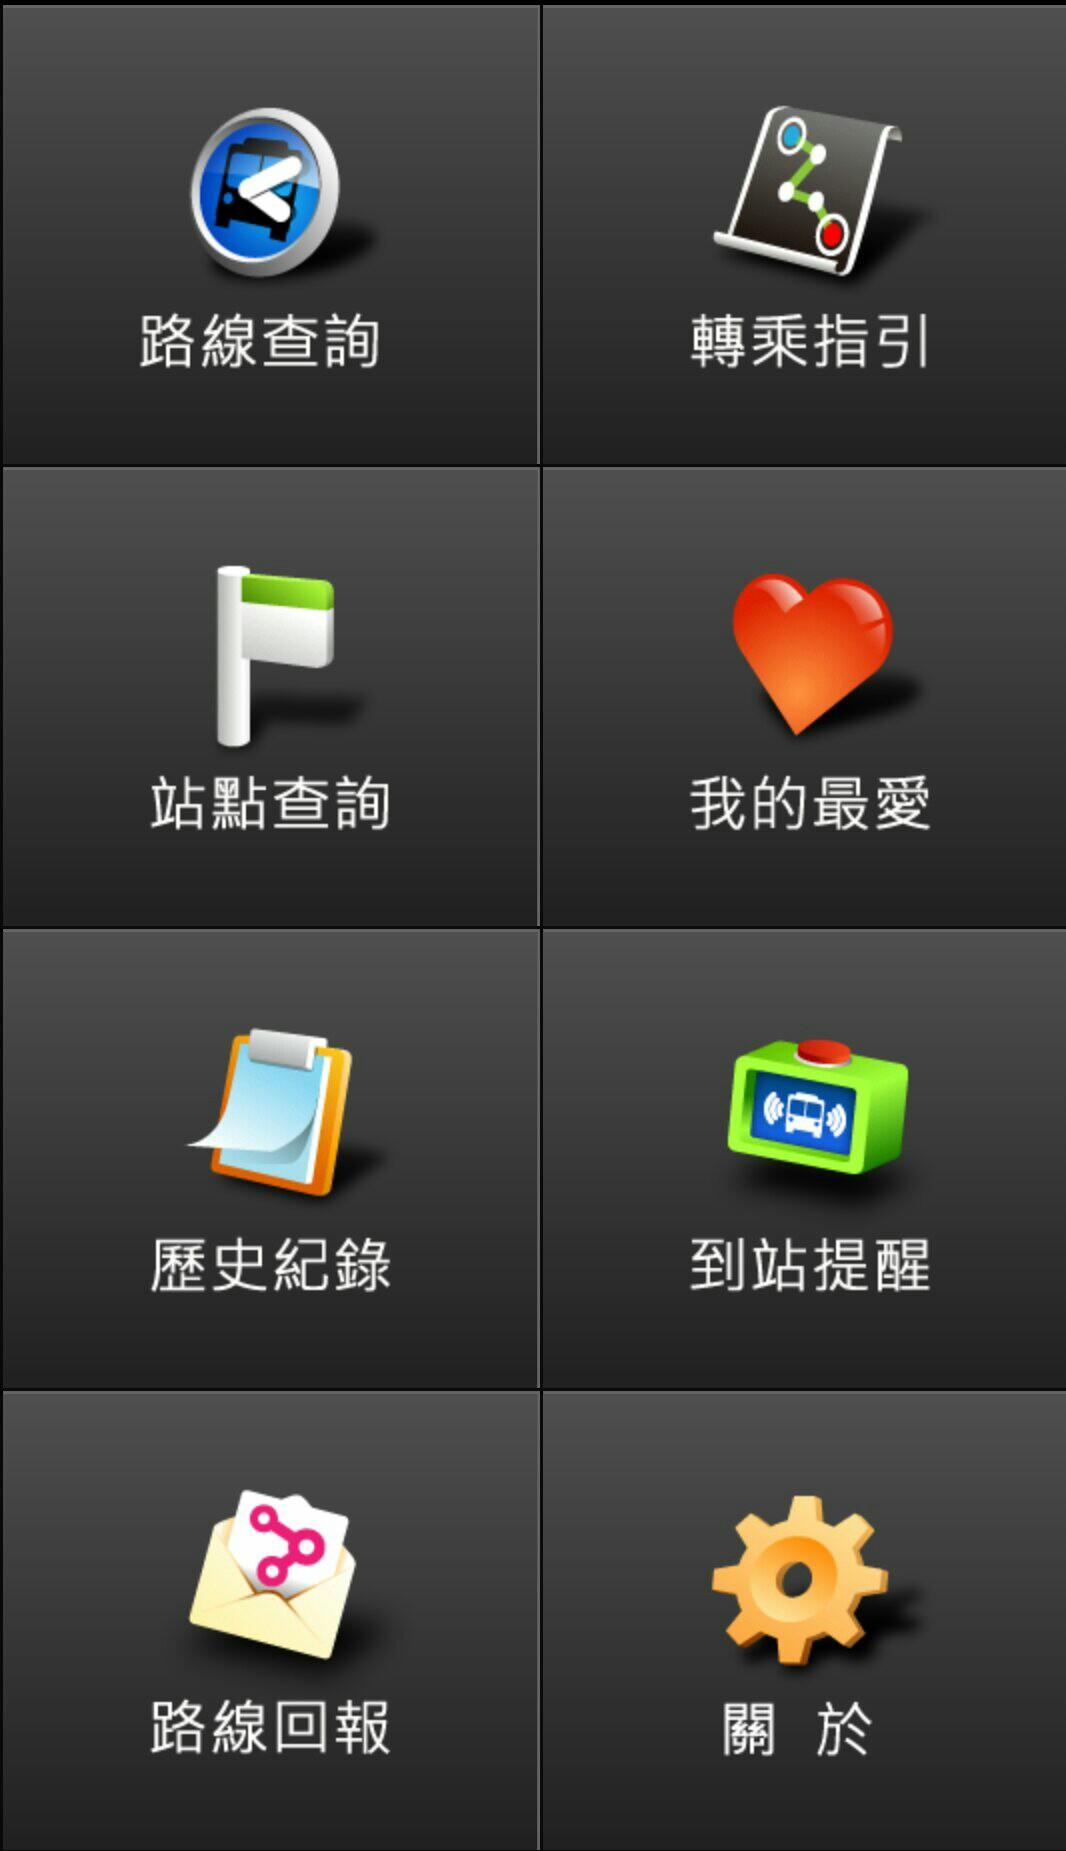 (Android)樂客轉乘通v.2.1.1.59